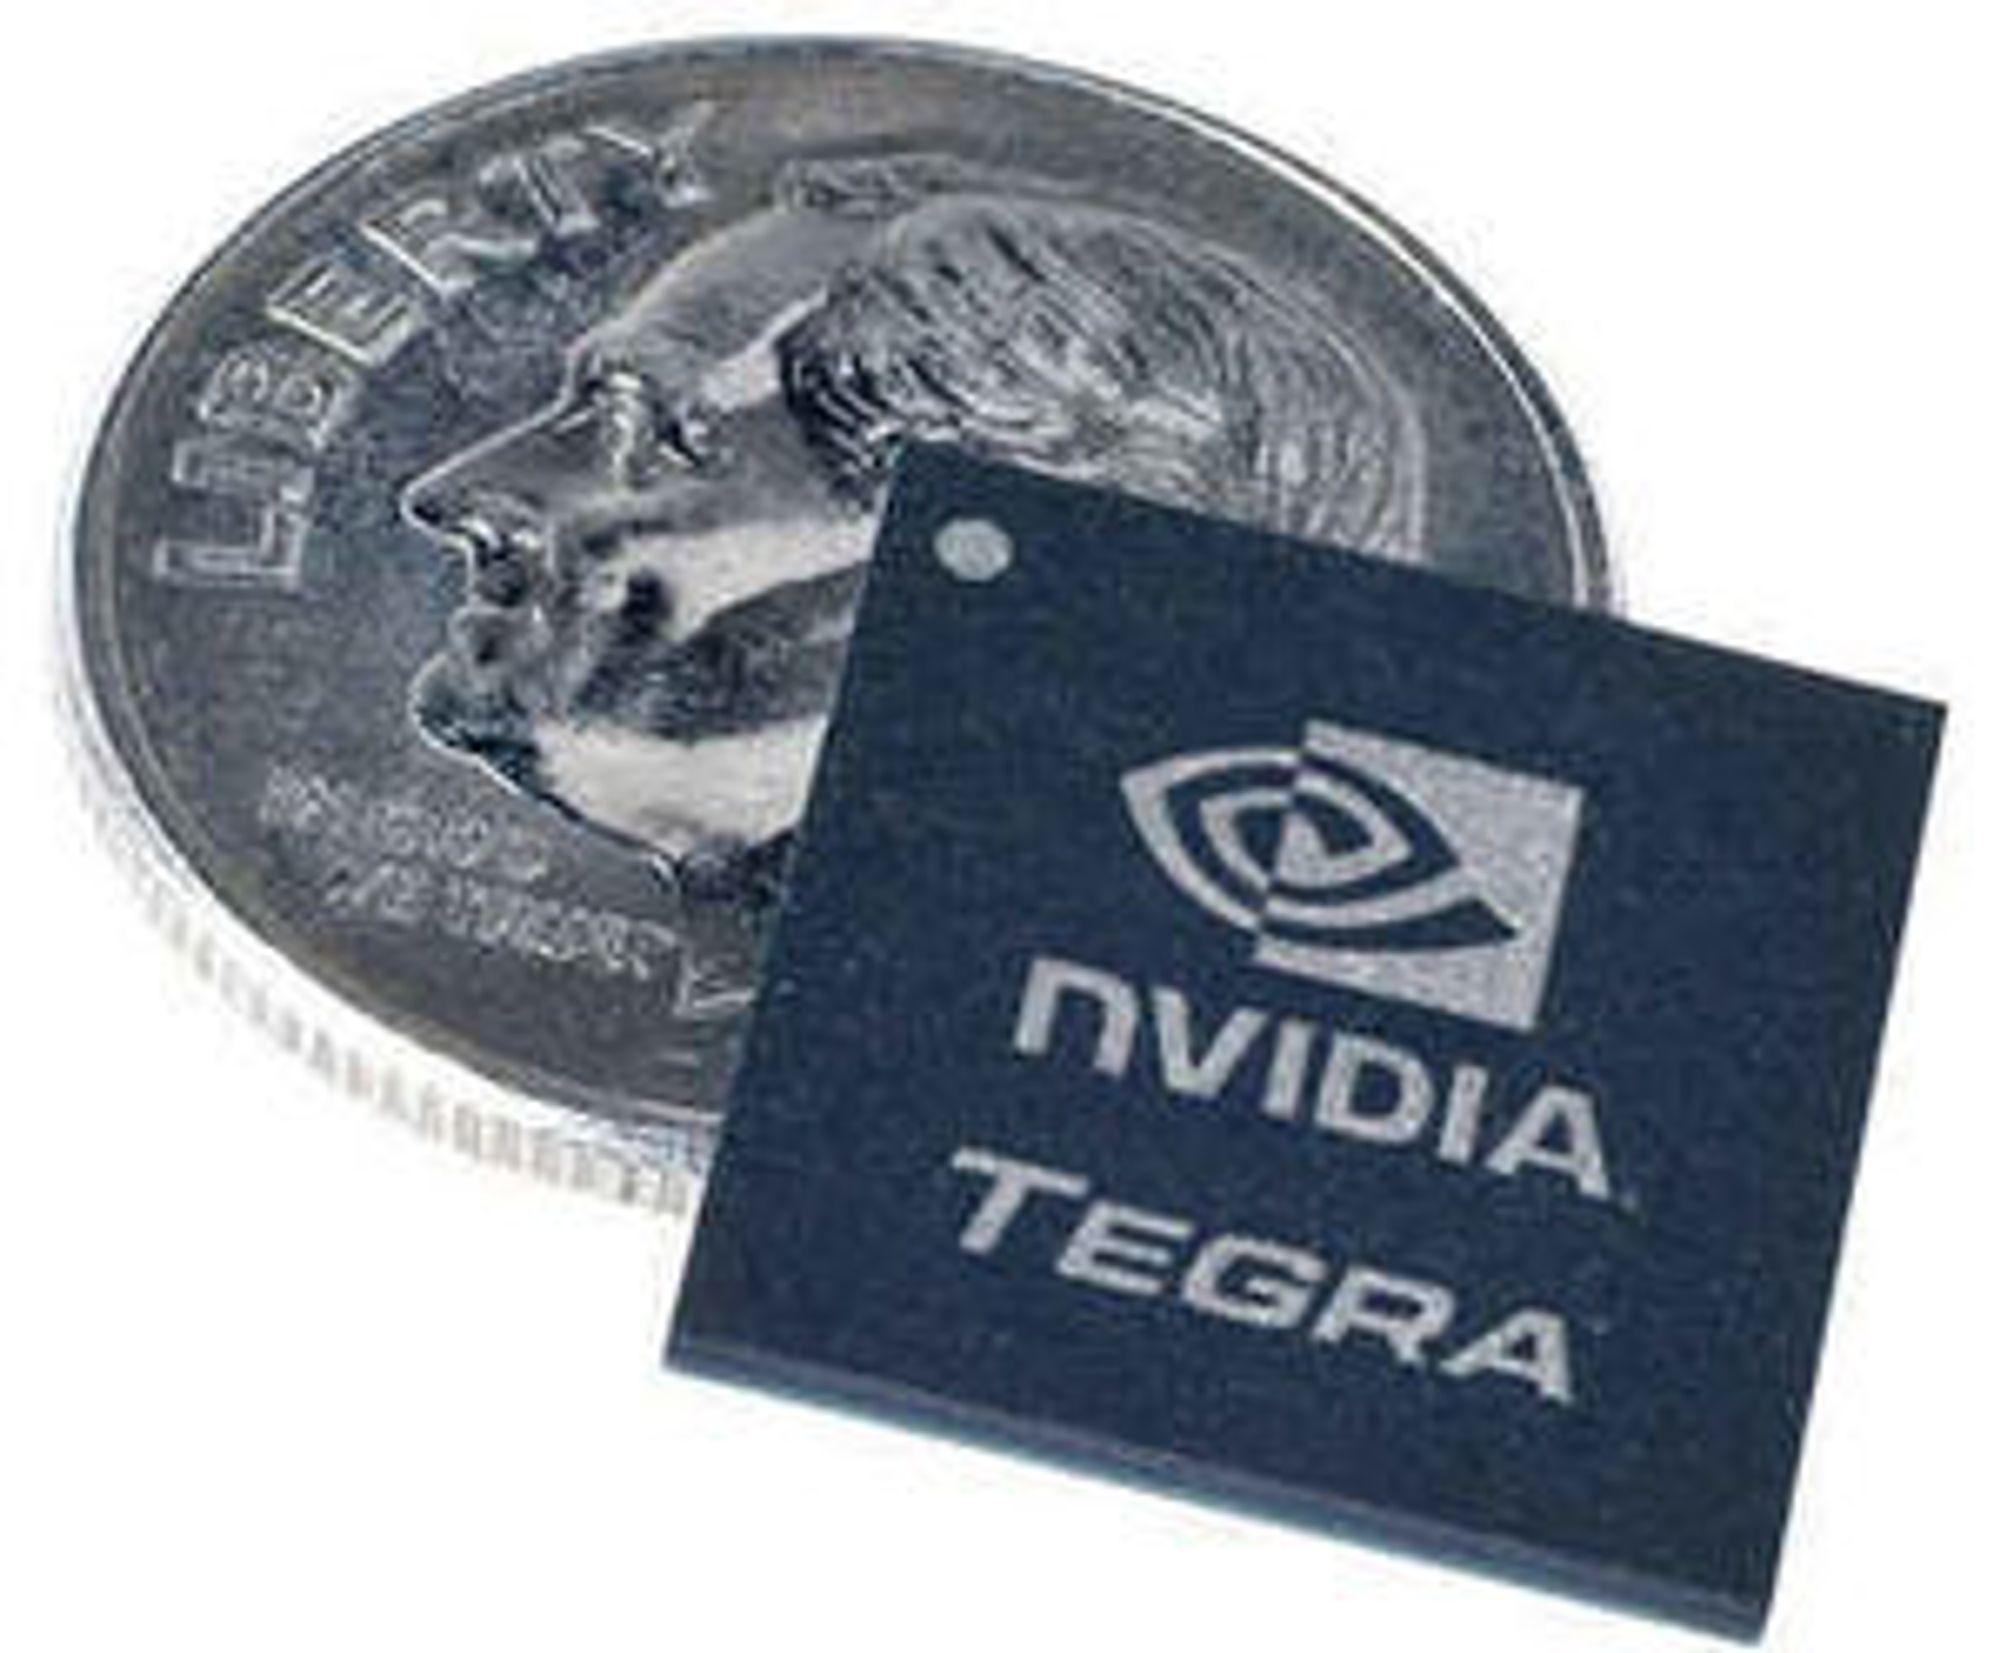 Tegra 600 sammenlignet med en 10 cents-mynt